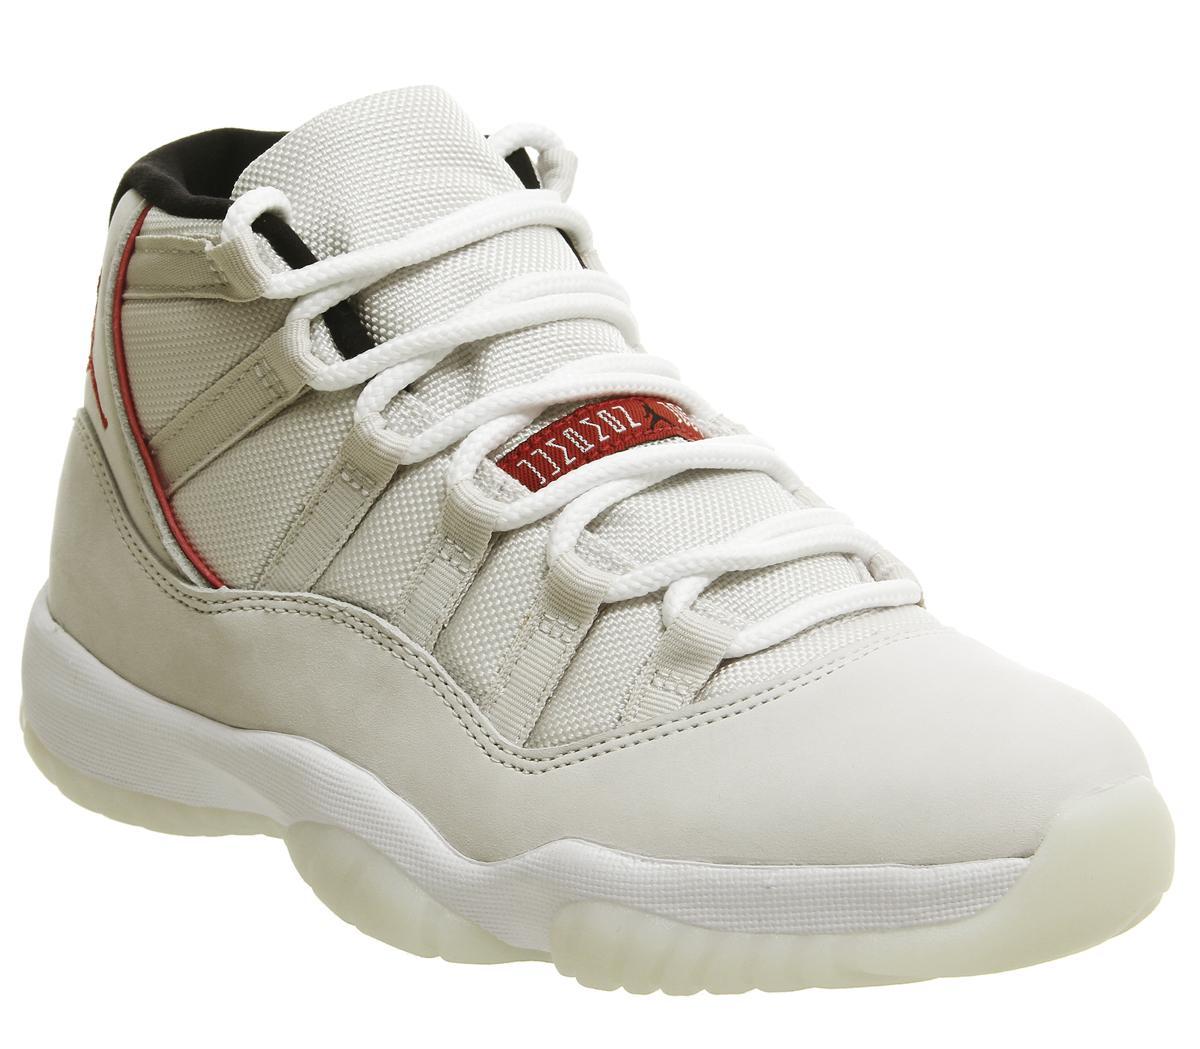 bloquear Desilusión Deflector  Jordan Jordan 11 Retro Trainers Platinum Tint University Red Sail - His  trainers